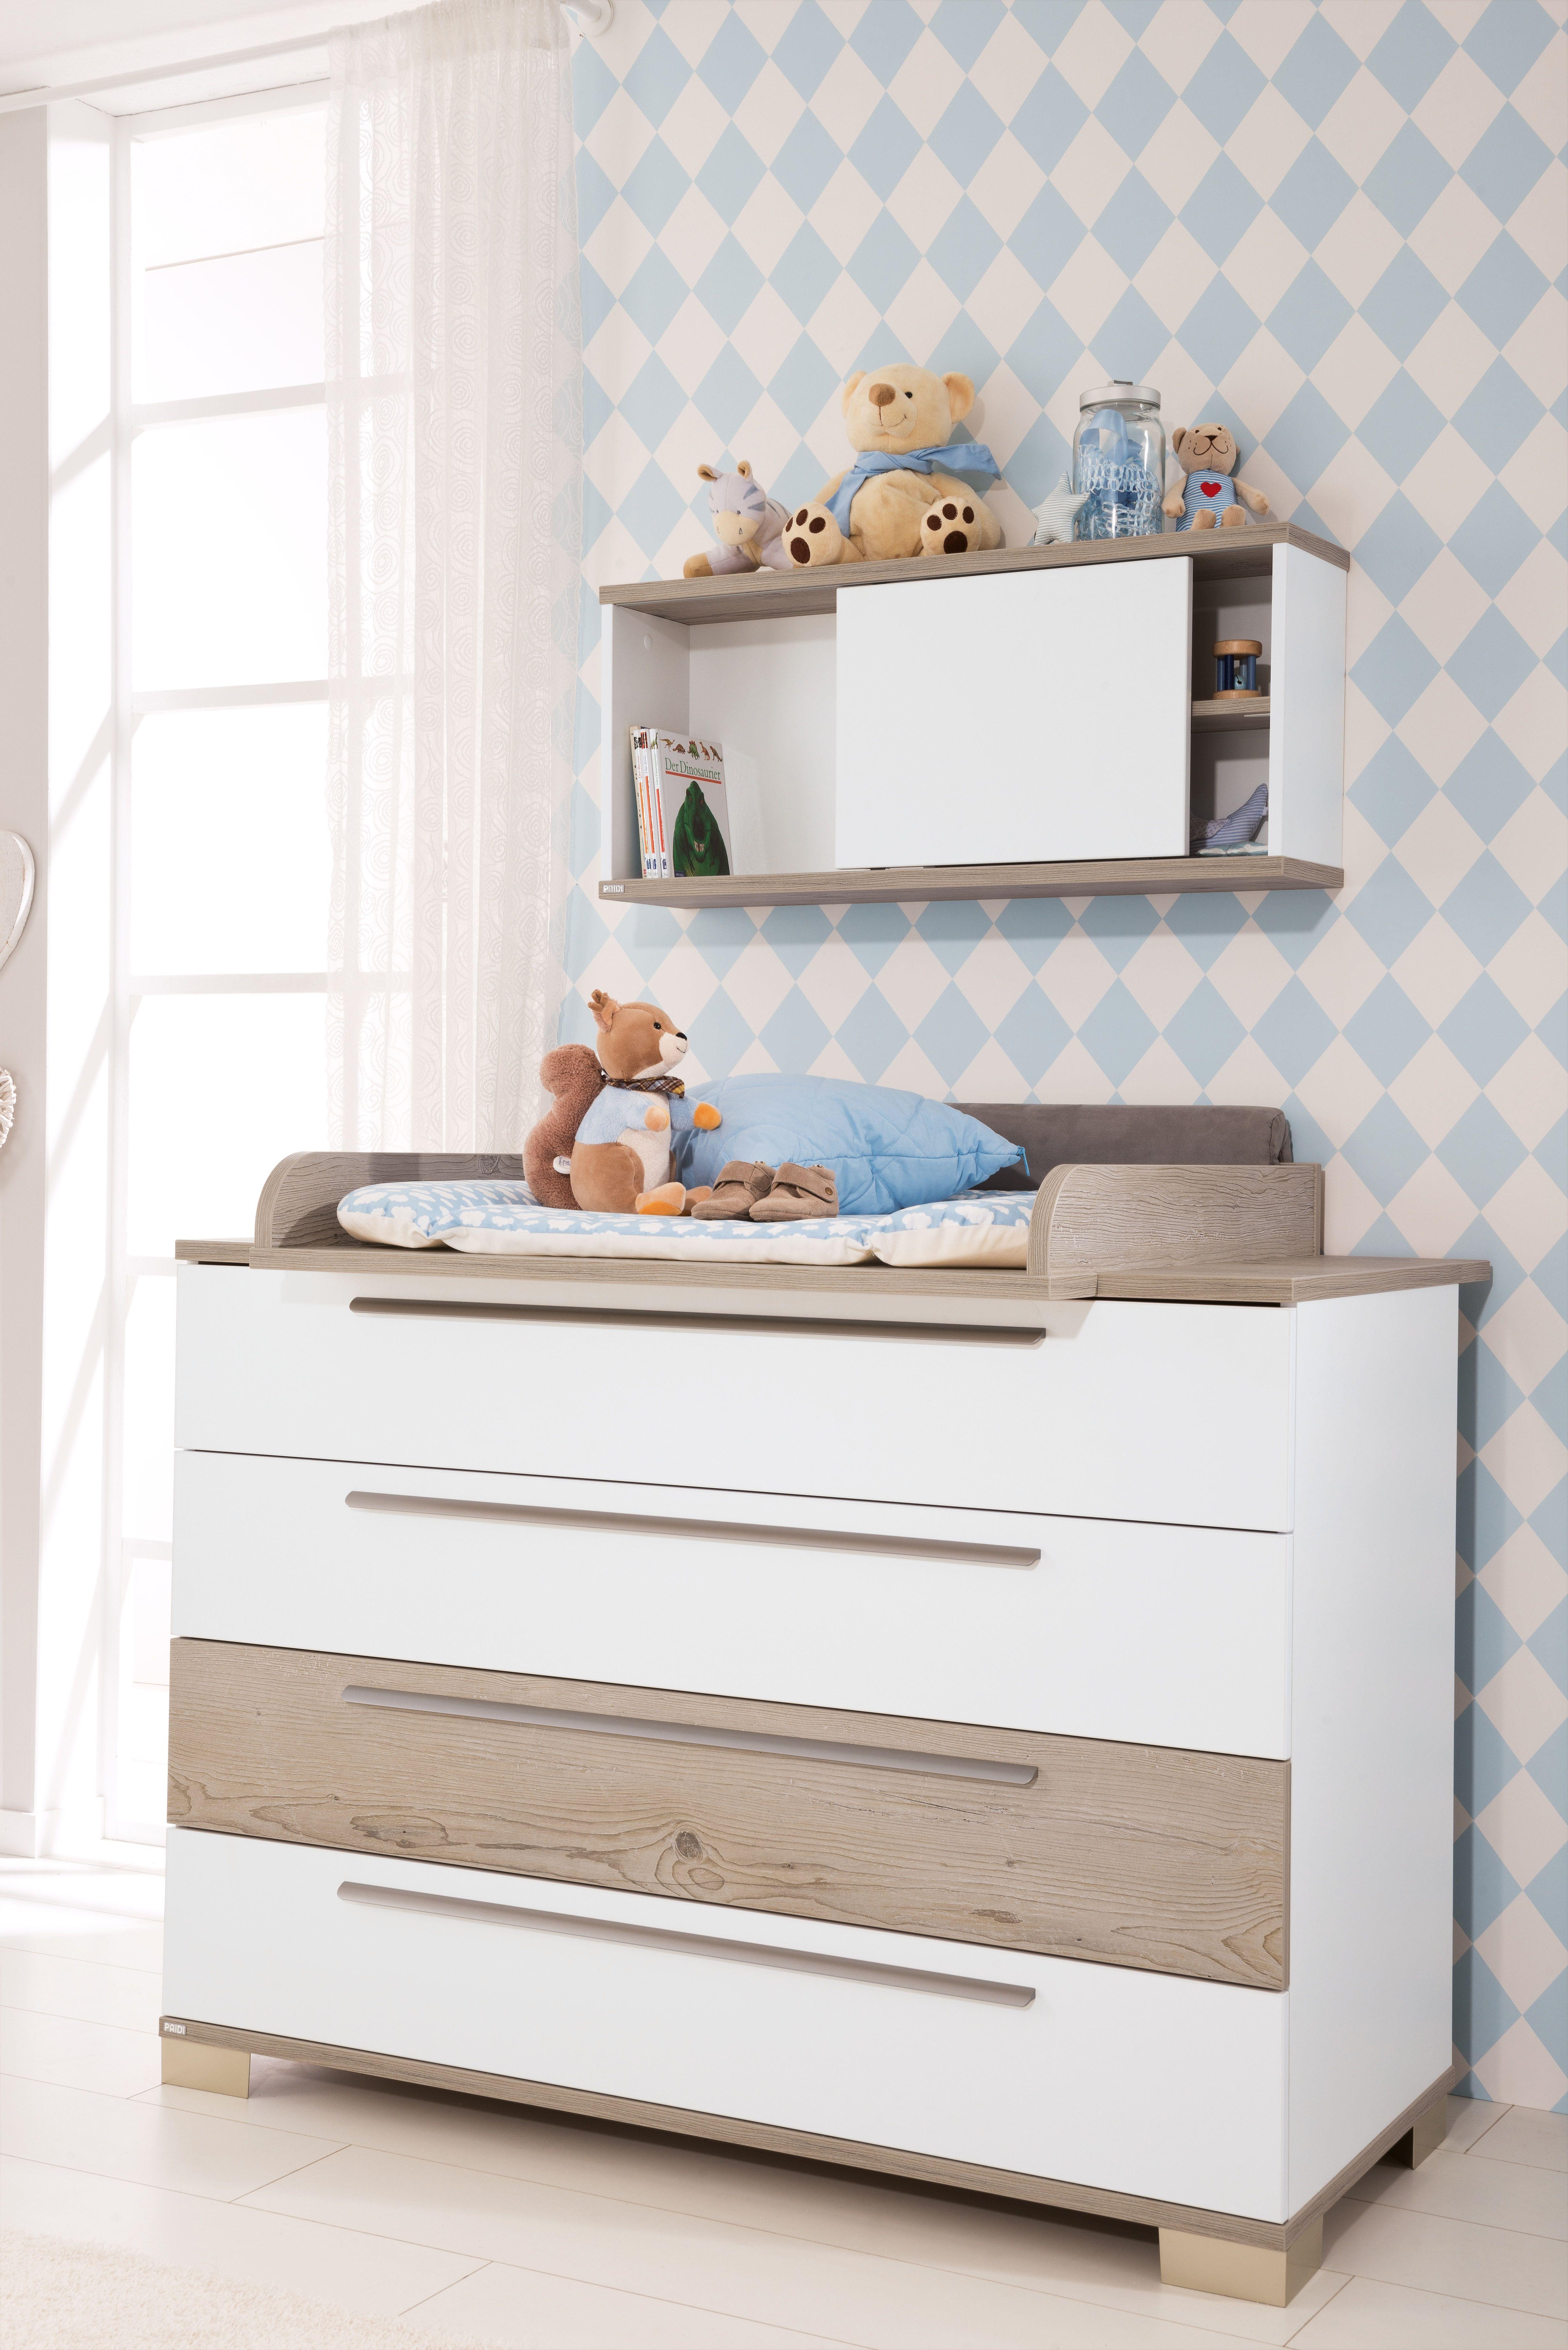 Babyrooms Home Interior Design Home Decor Furniture